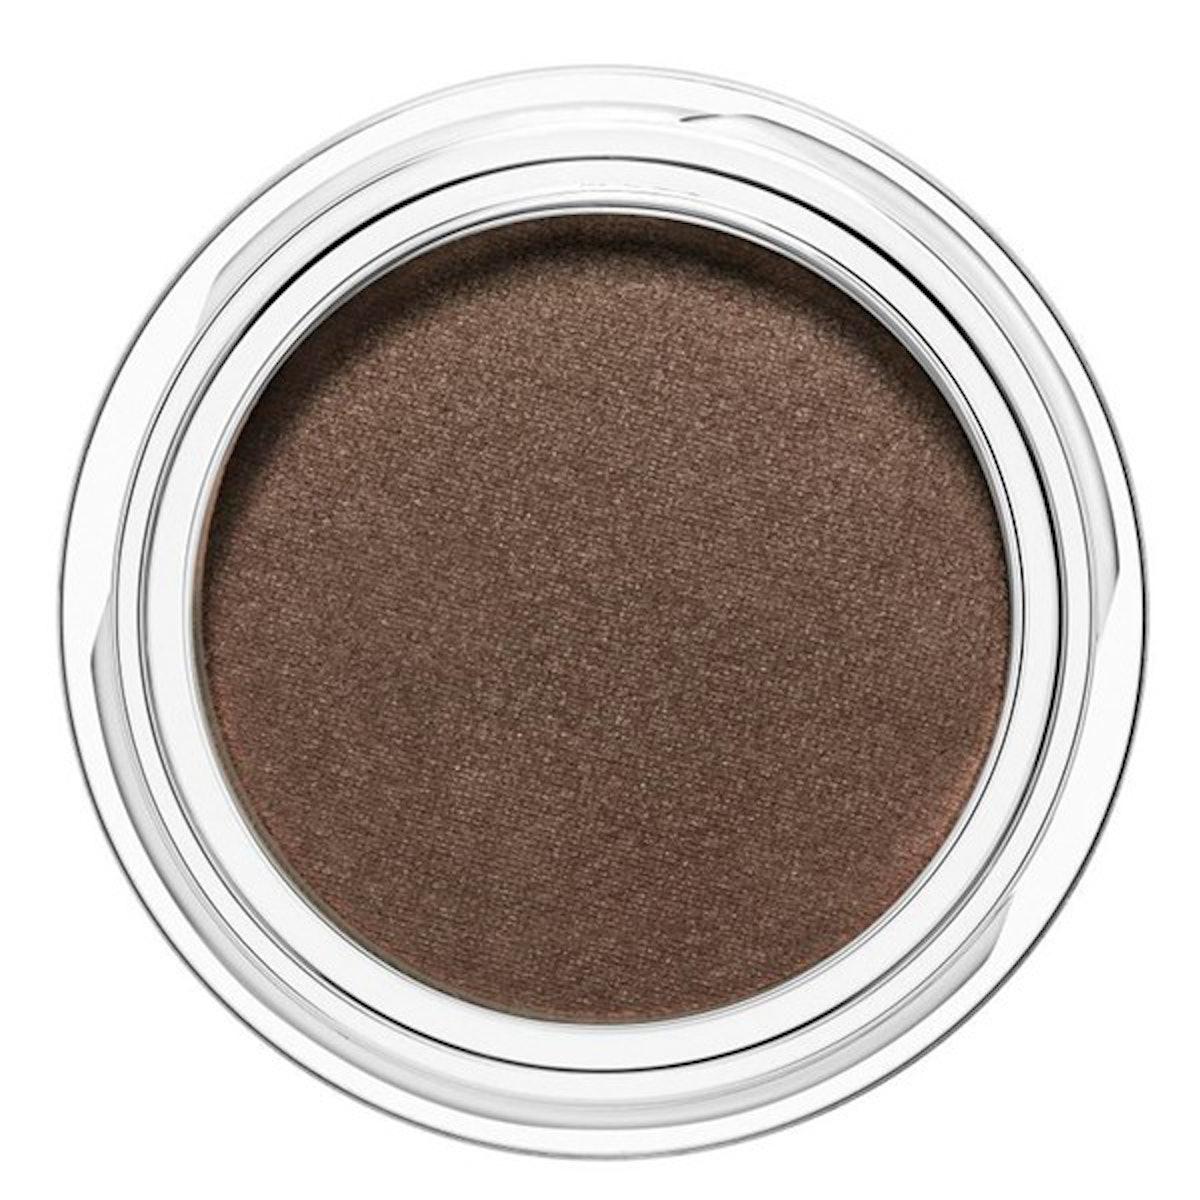 Clarins Ombré Matte Cream-to-Powder Eyeshadow in Taupe